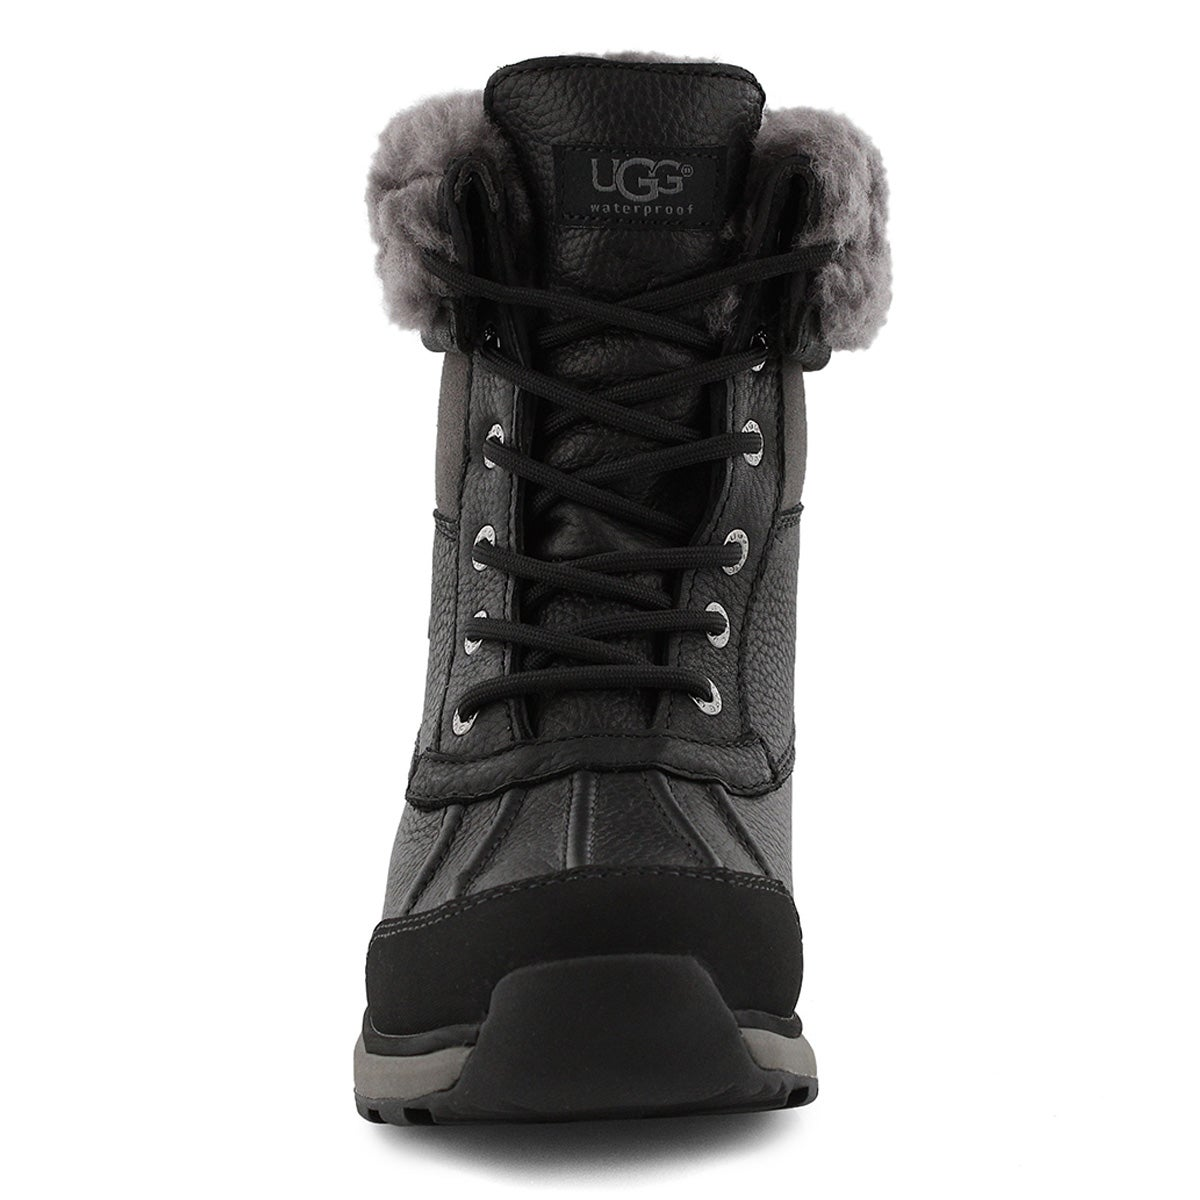 c0aadcd4584 Women's ADIRONDACK III black winter boots